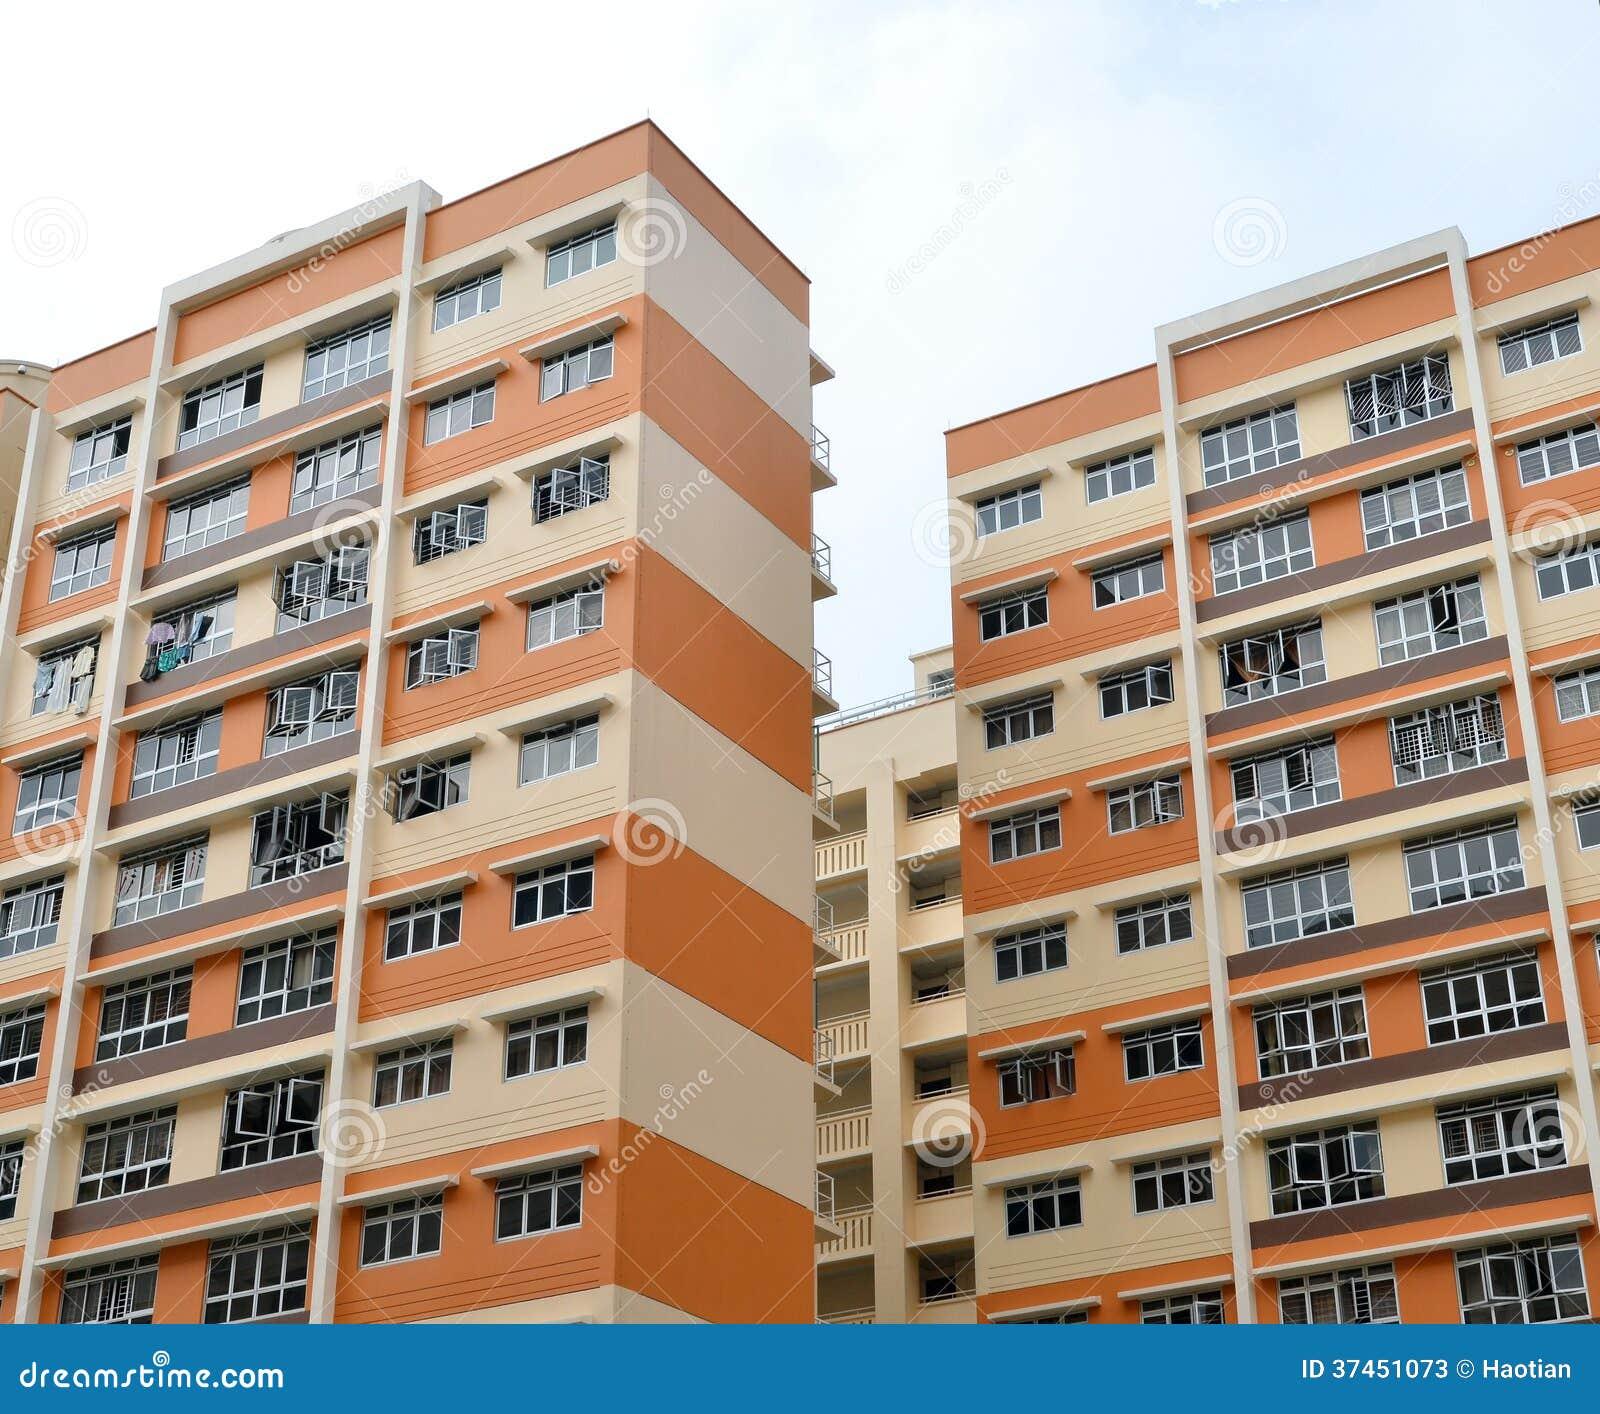 Apartments In Singapore: Singapore Public Housing Blocks Stock Image